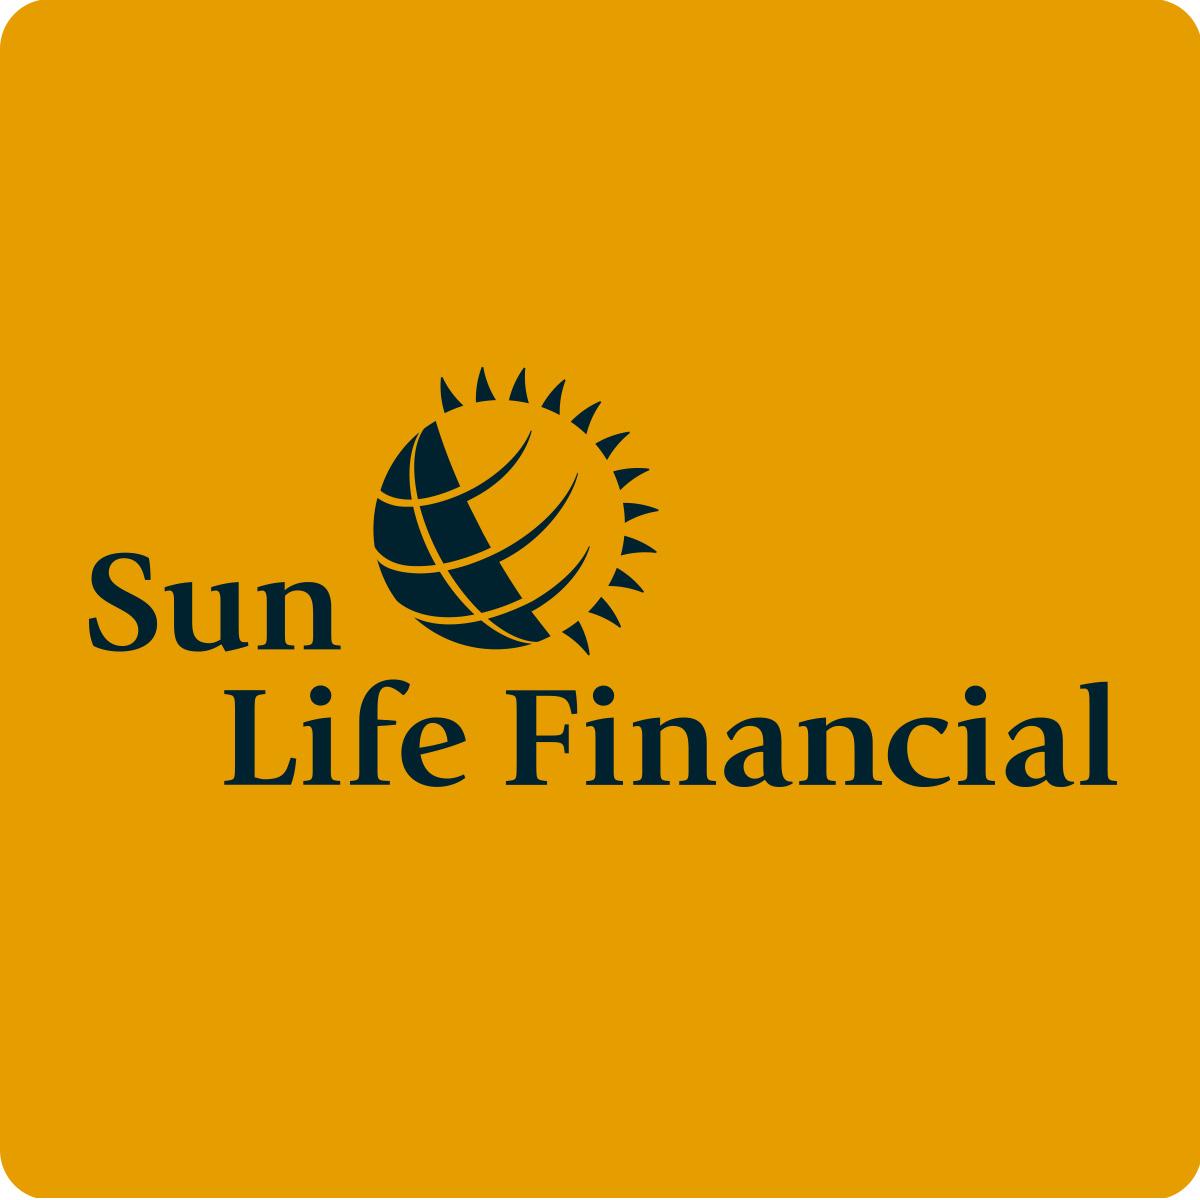 sun life_logo_yellowbkgrd_bluelogo_1200x1200.jpg